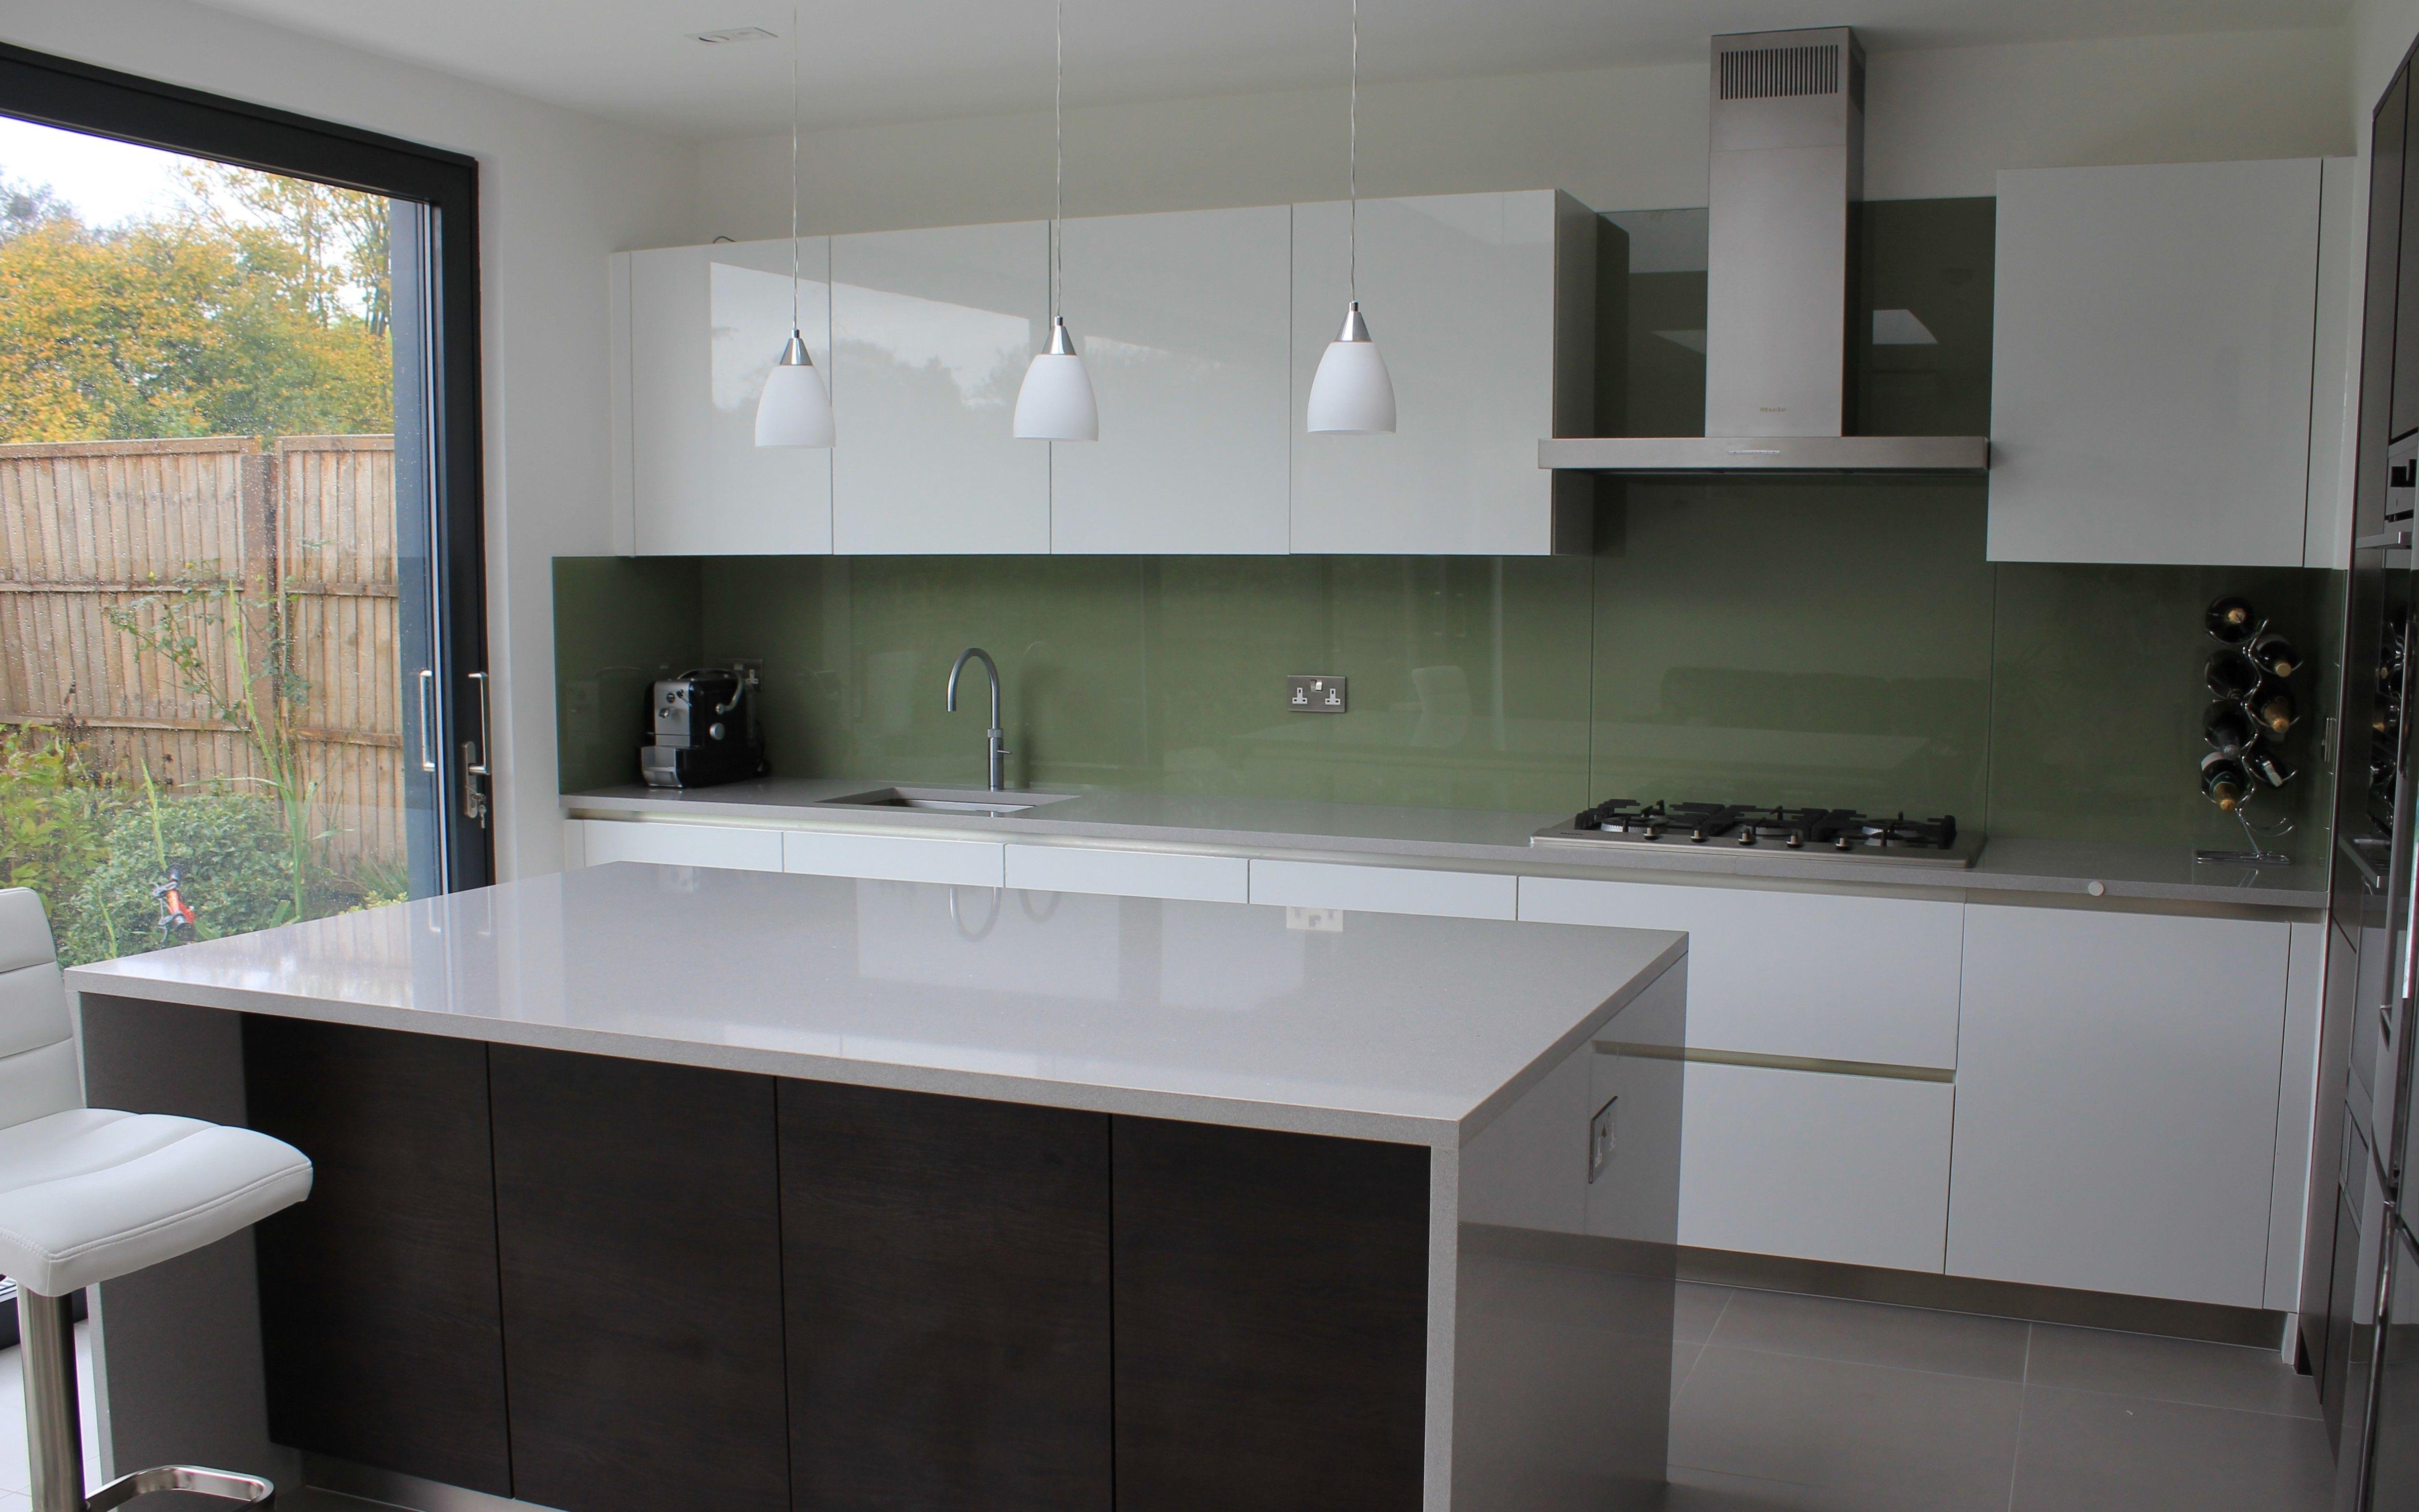 Silestone aluminio nube quartz kitchen worktops and island - Silestone aluminio nube ...